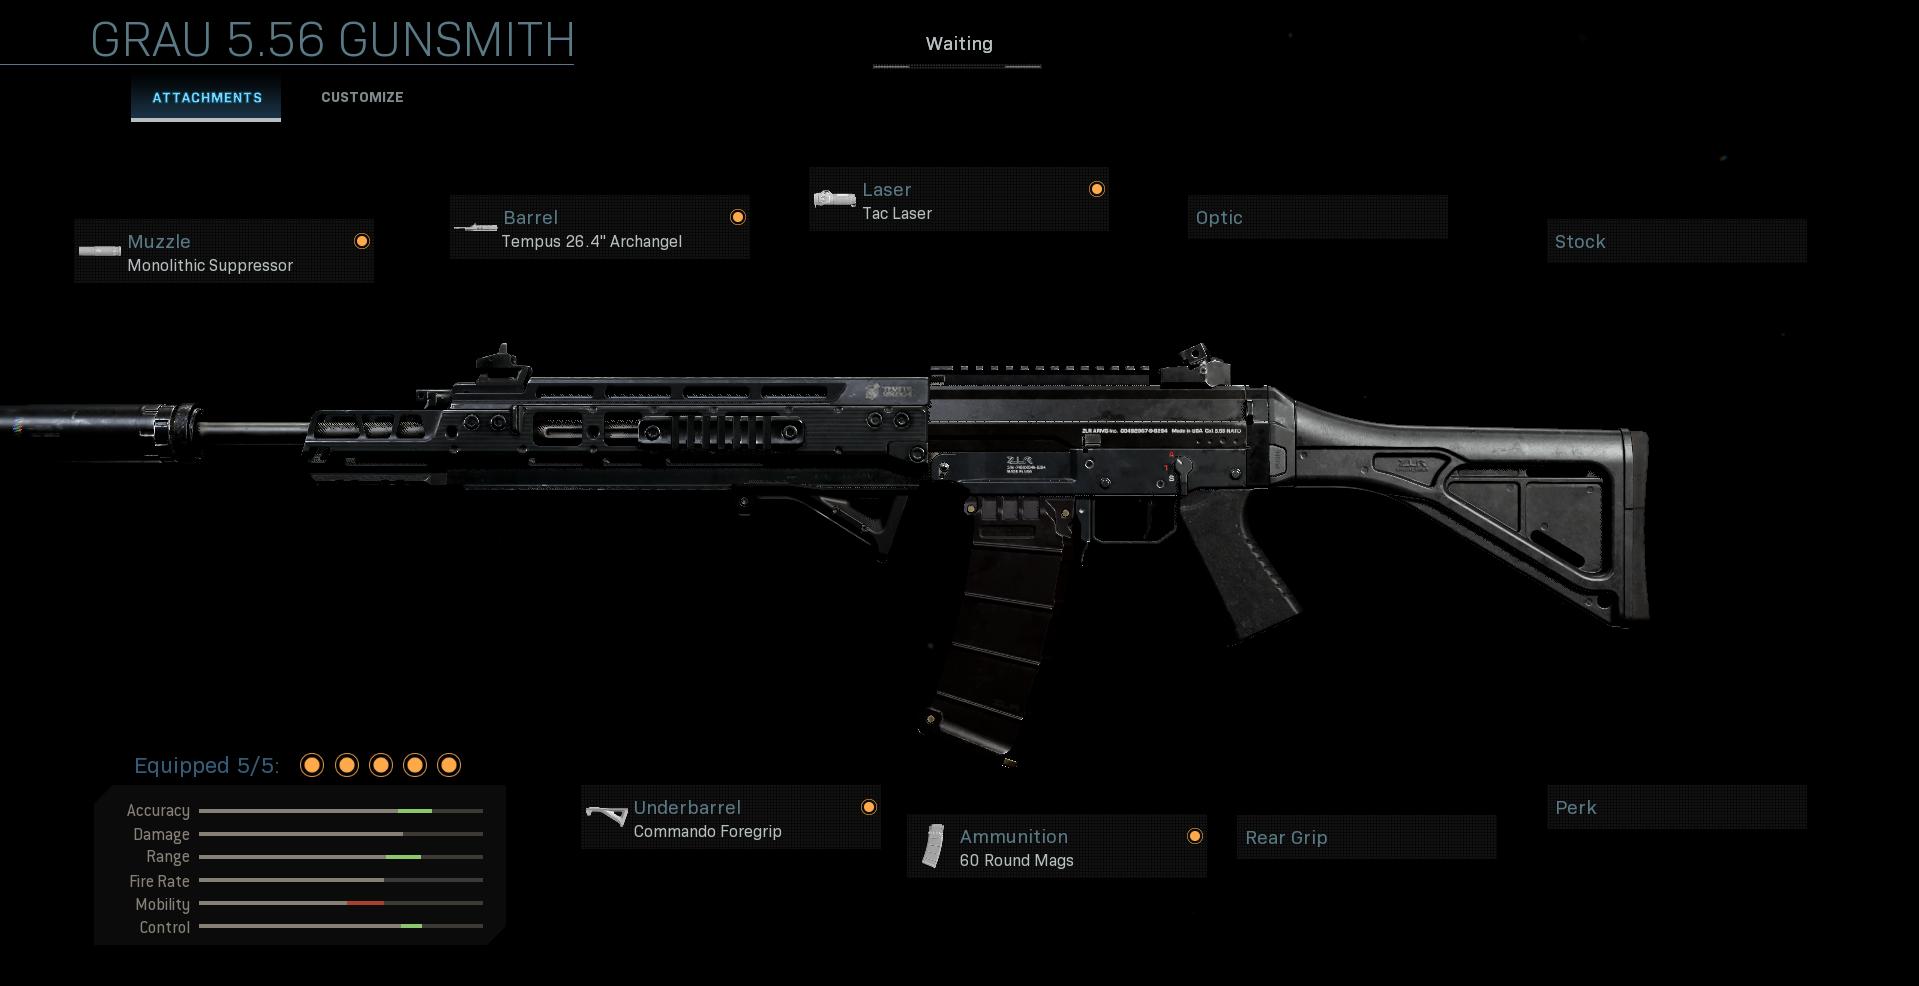 Grau 5.56 Gunsmith Gun Warzone